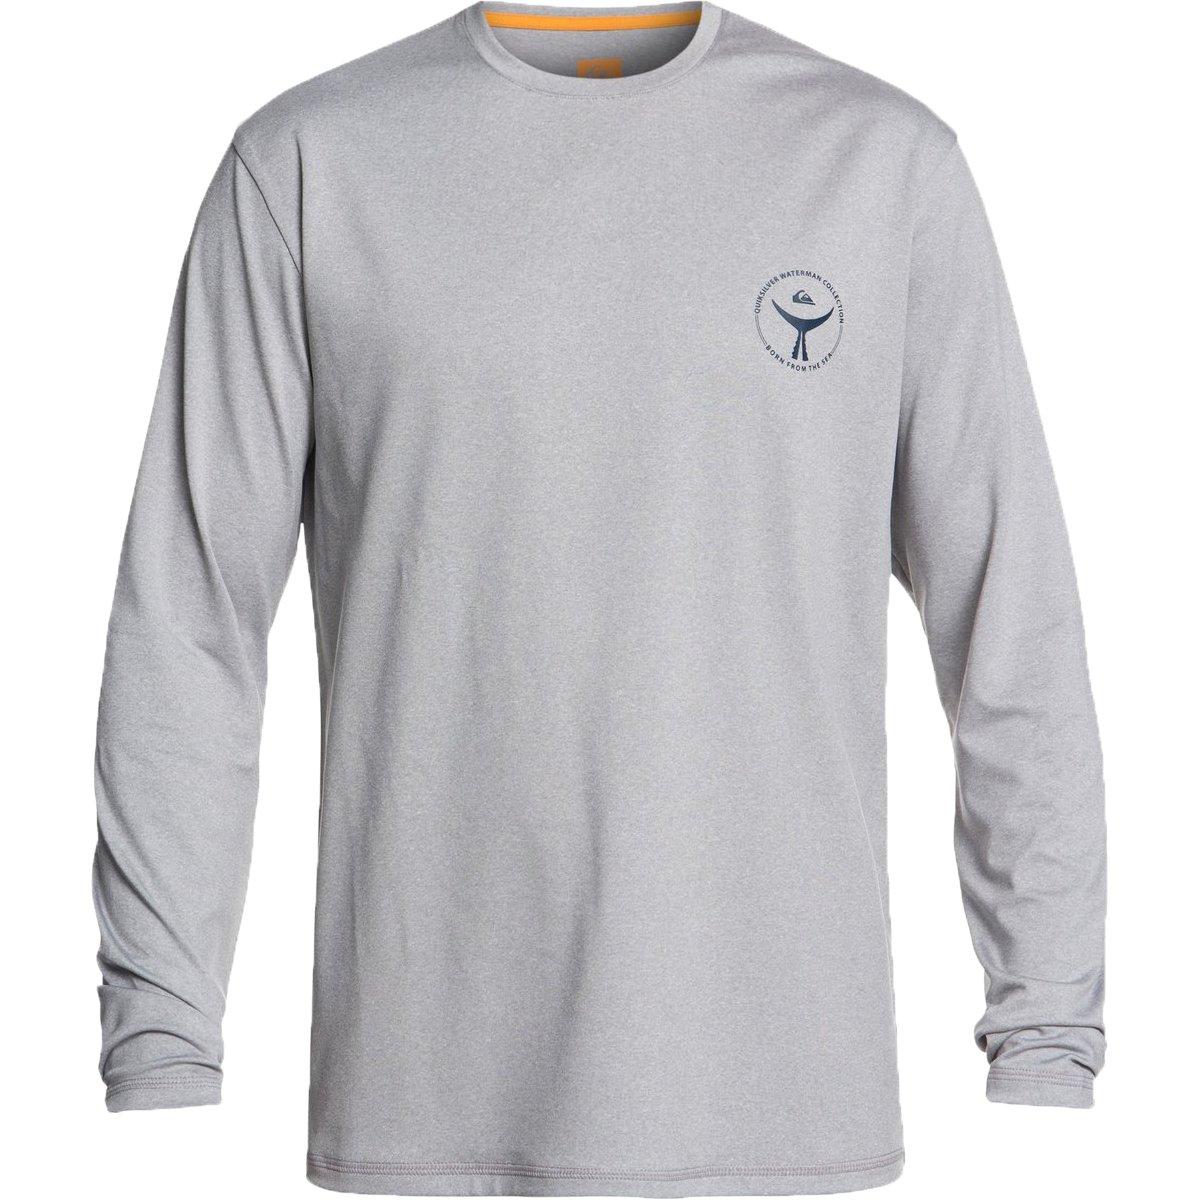 Quiksilver Waterman Men's Watermark LS 50+ UPF Long Sleeve Rashguard, Grey Marl, L